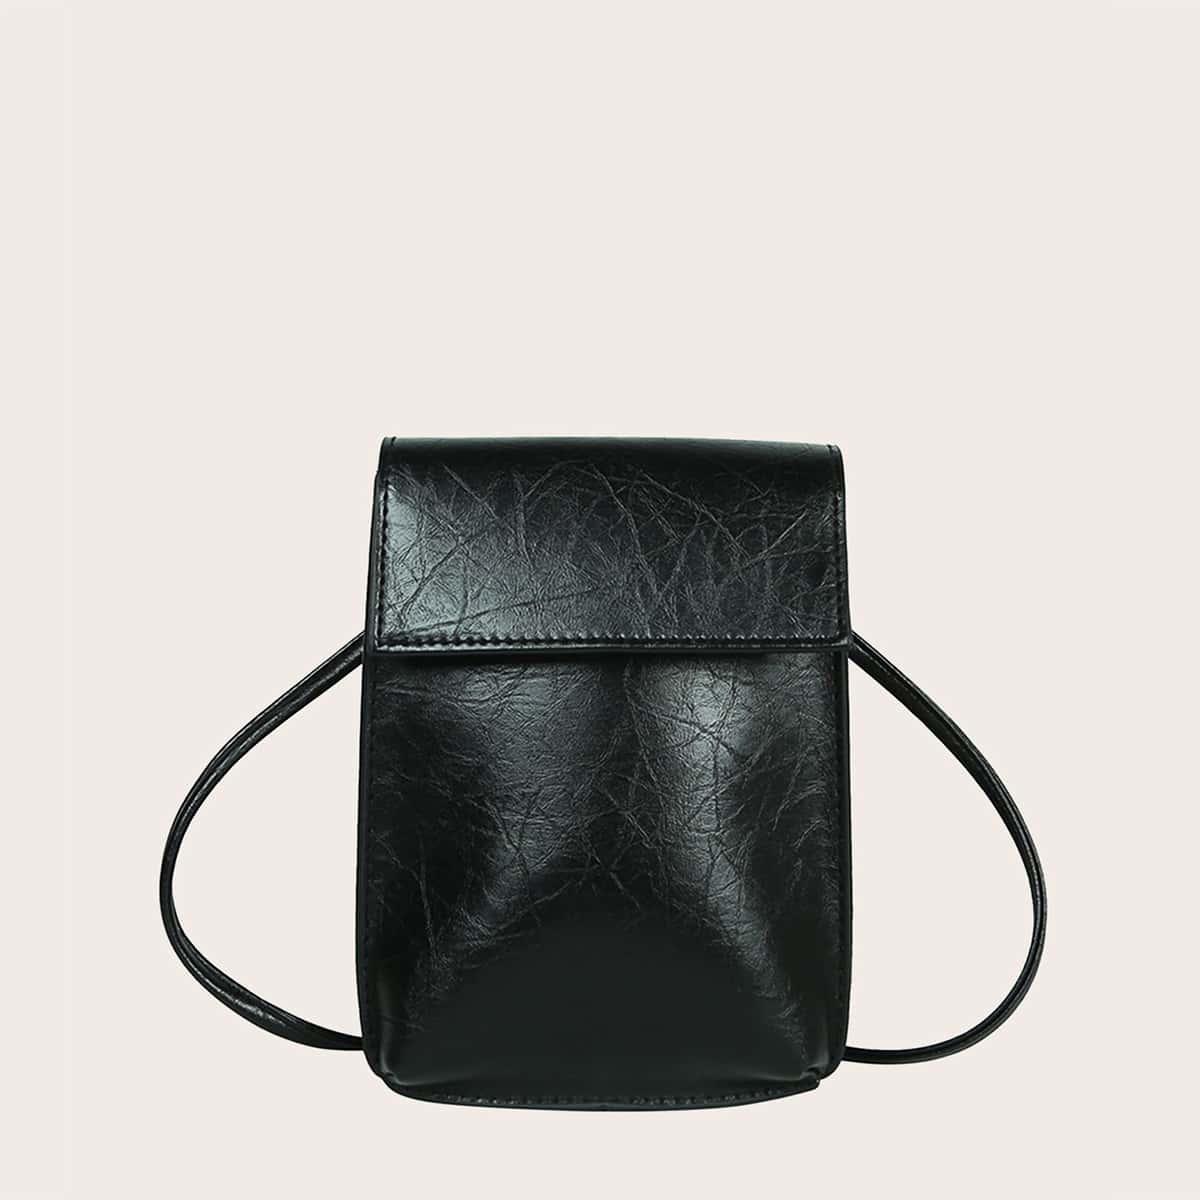 shein Eenvoudige messengertas met klep